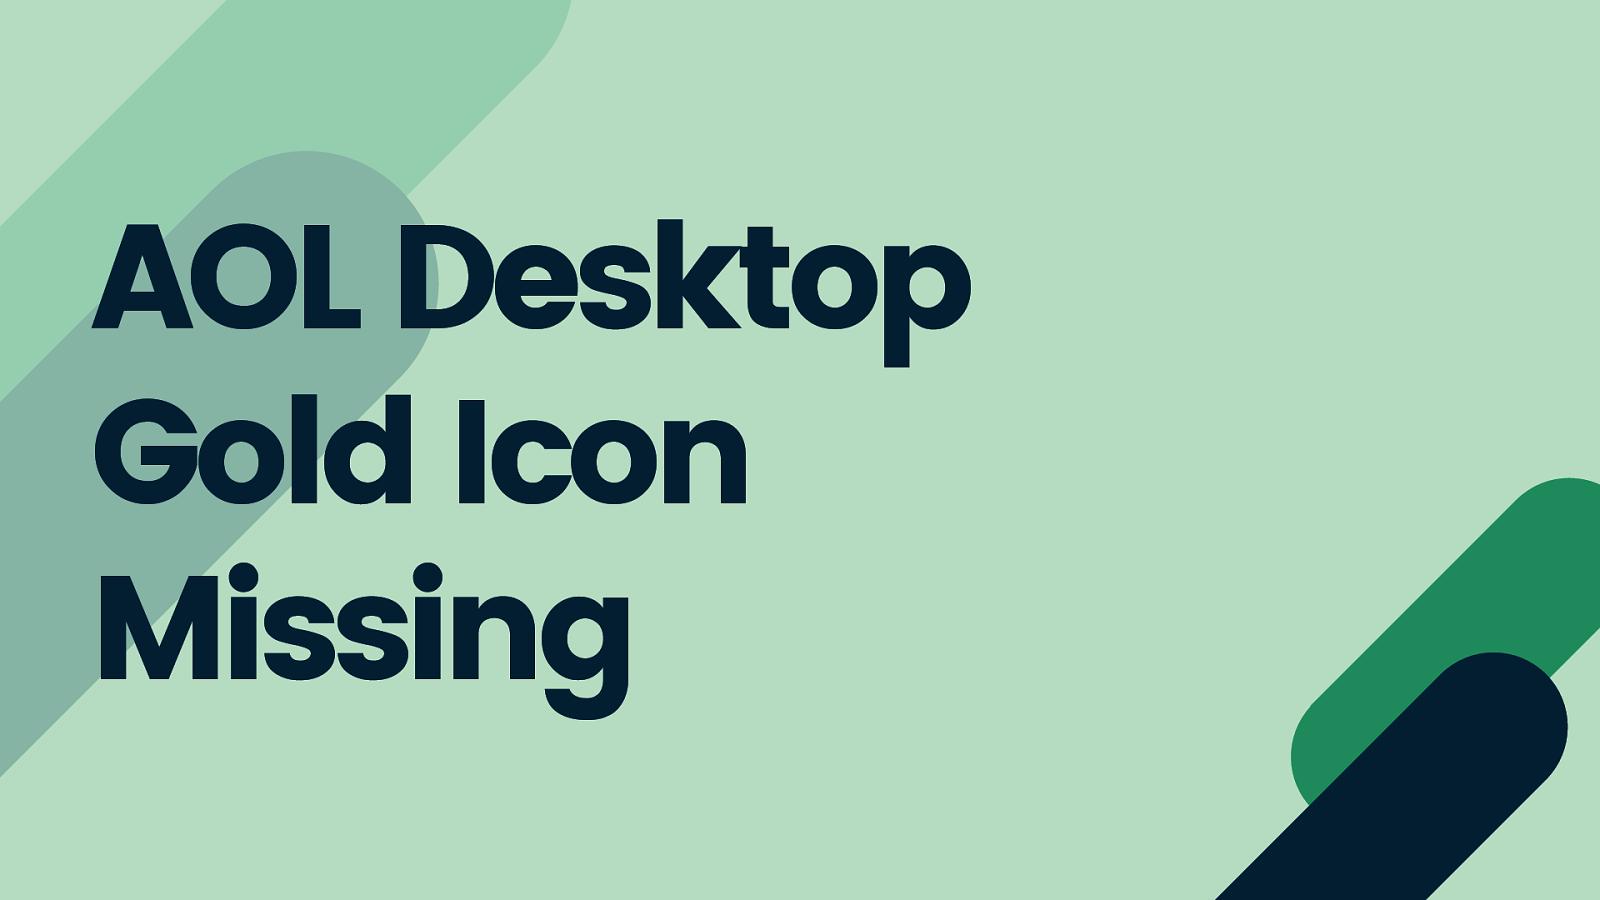 AOL Desktop Gold Icon Missing |Troubleshoot